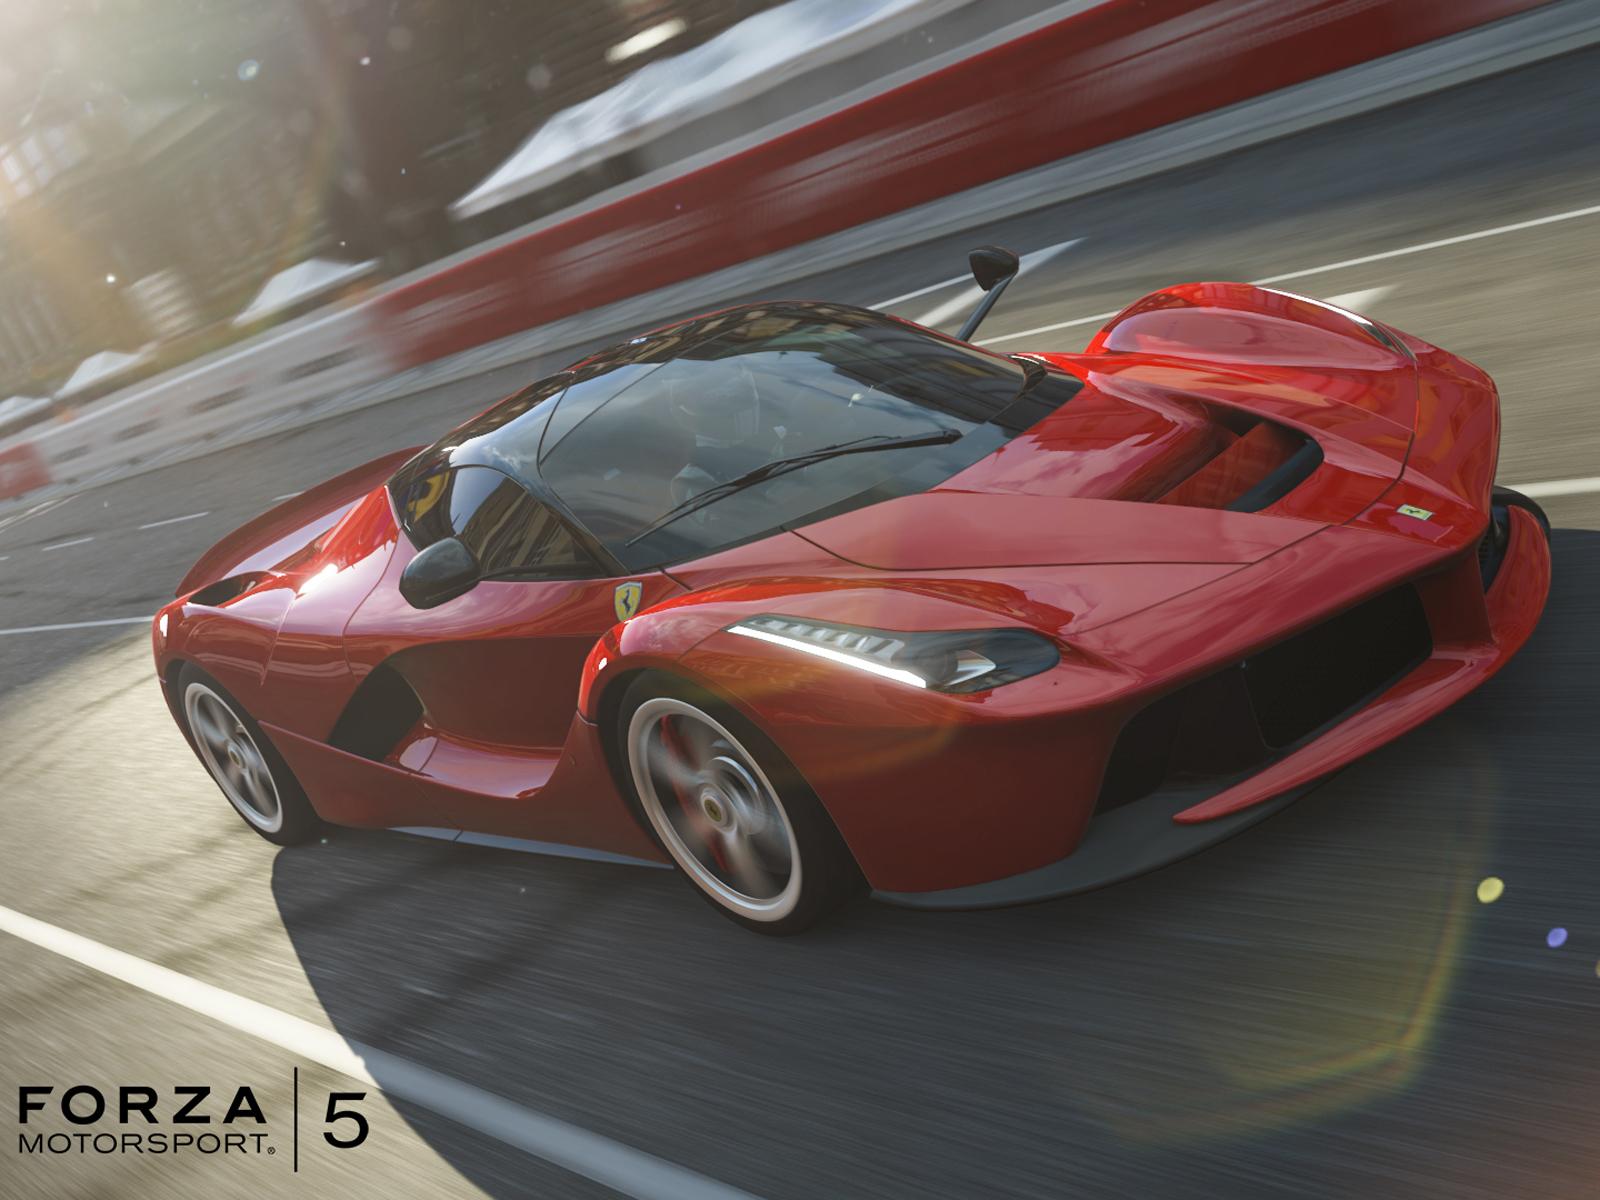 Forza Motorsport 5 HD wallpaper 1 2 1600x1200